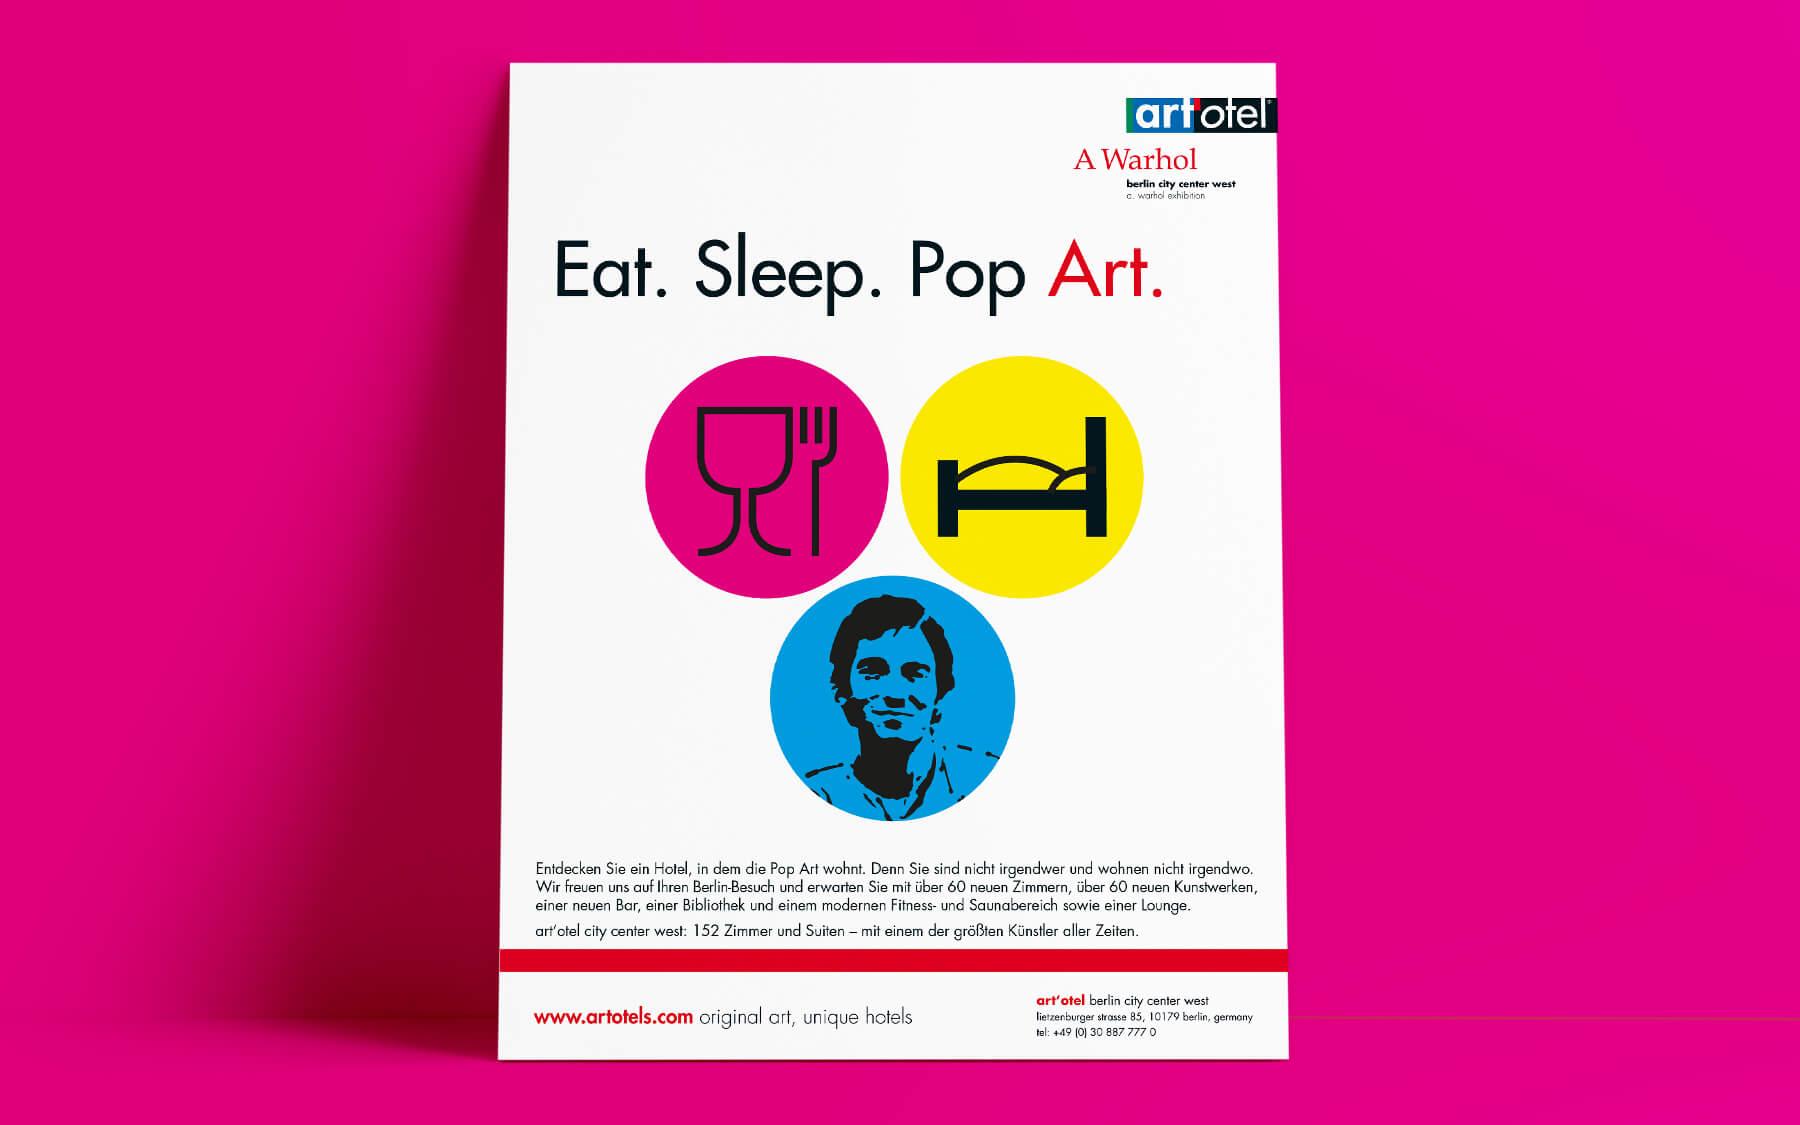 kreativagentur berlin creativ ideenschmiede factory werbeagentur berlin sued art hotel otel eat sleep pop art